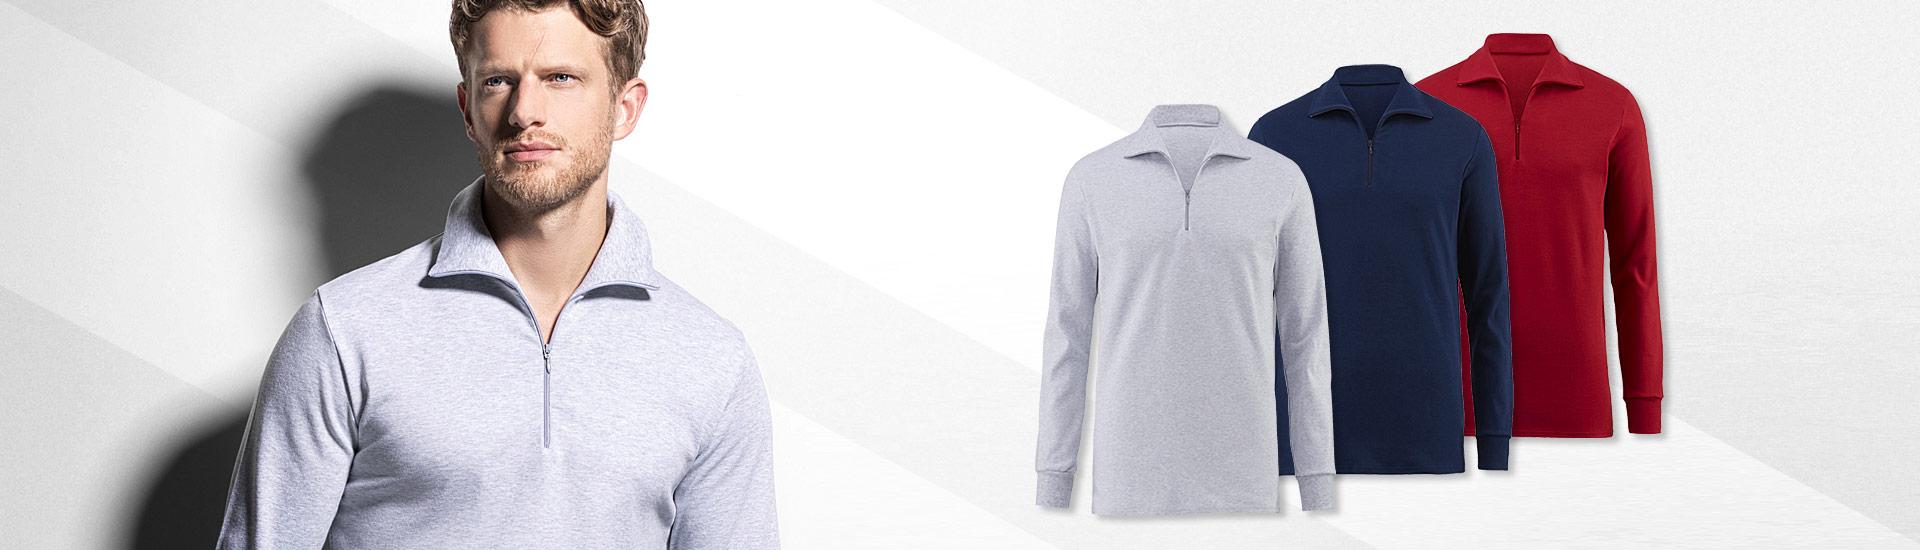 Shirts mit Zipper